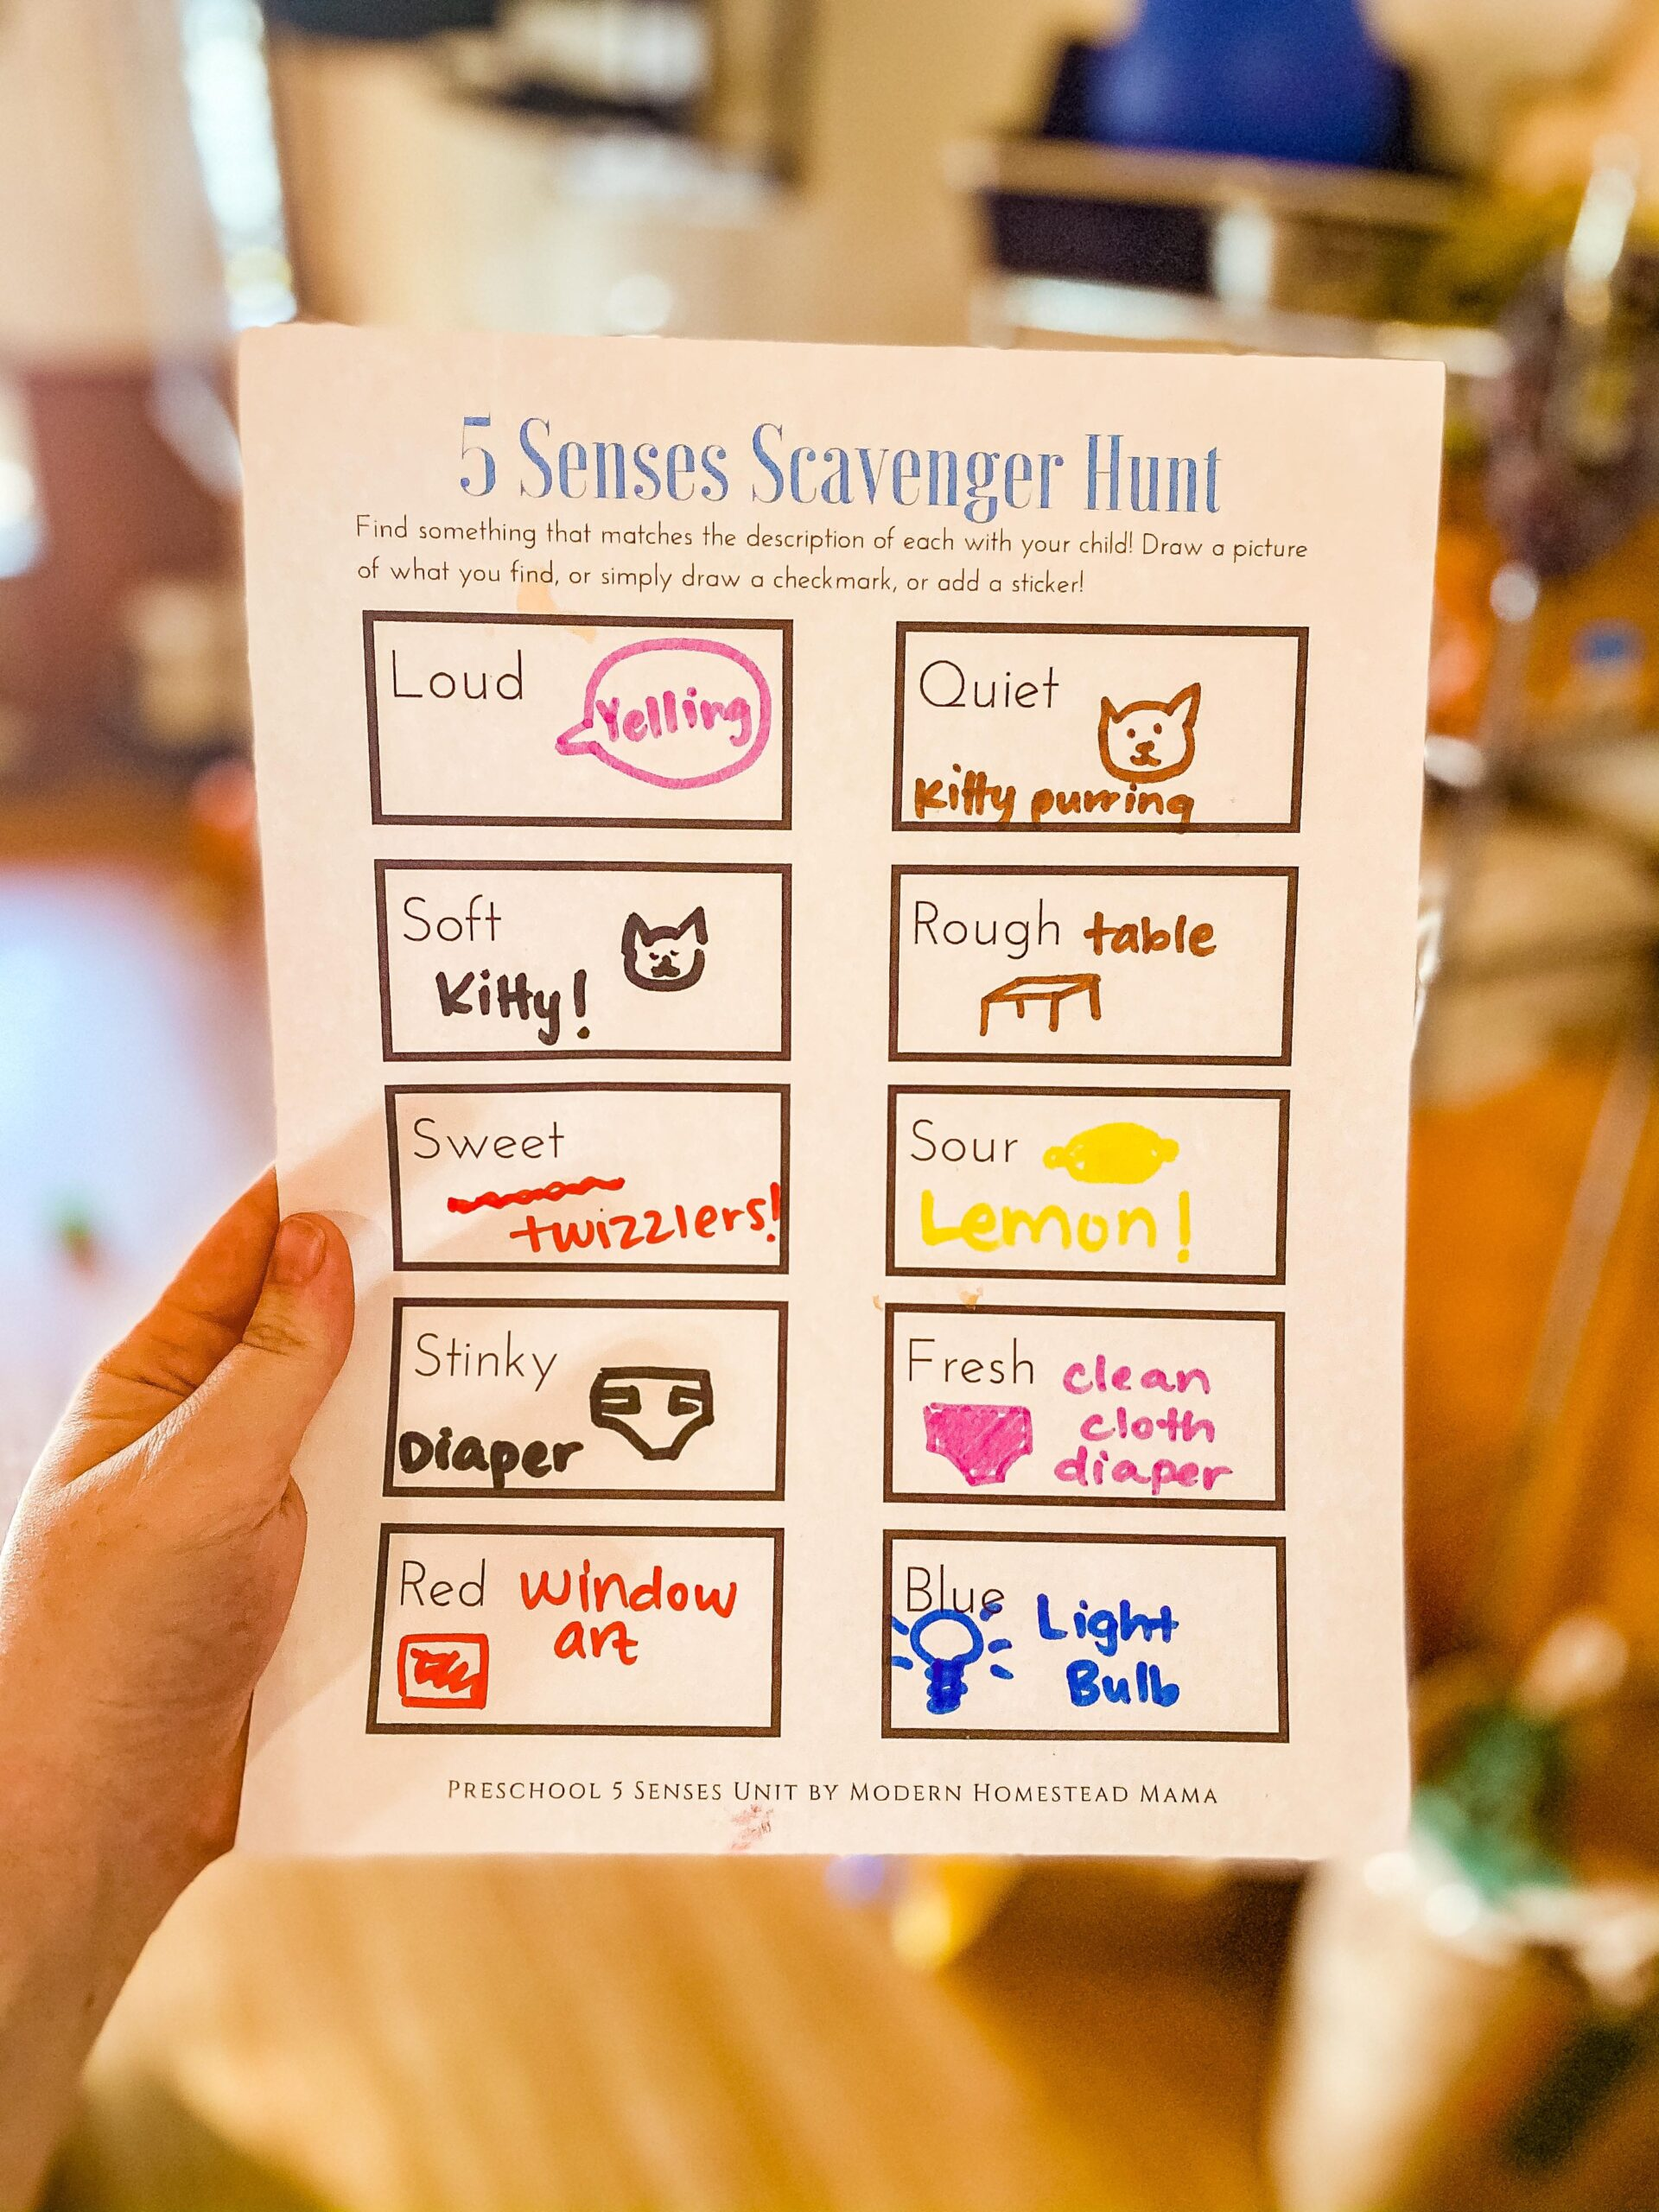 Five Senses Scavenger Hunt Printable for Kids | Modern Homestead Mama